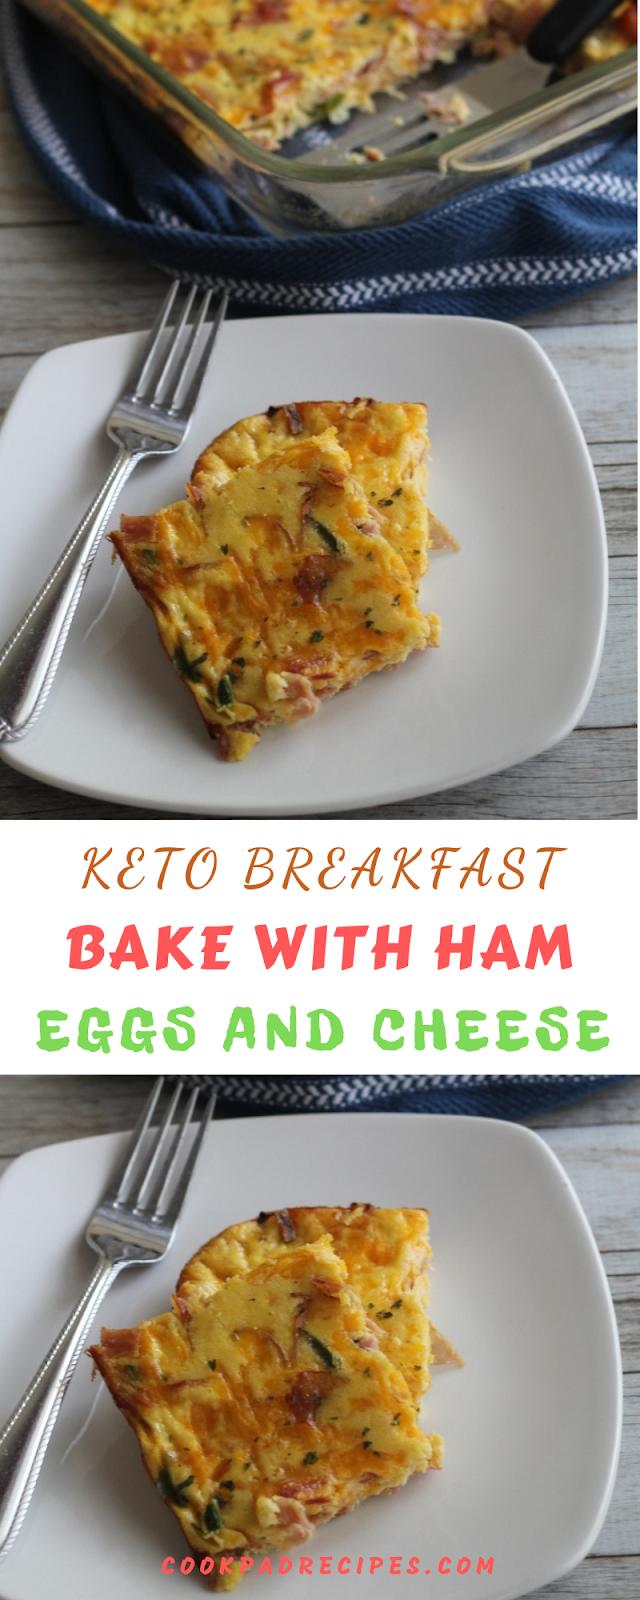 KETO BREAKFAST BAKE WITH HAM, EGGS AND CHEESE RECIPE